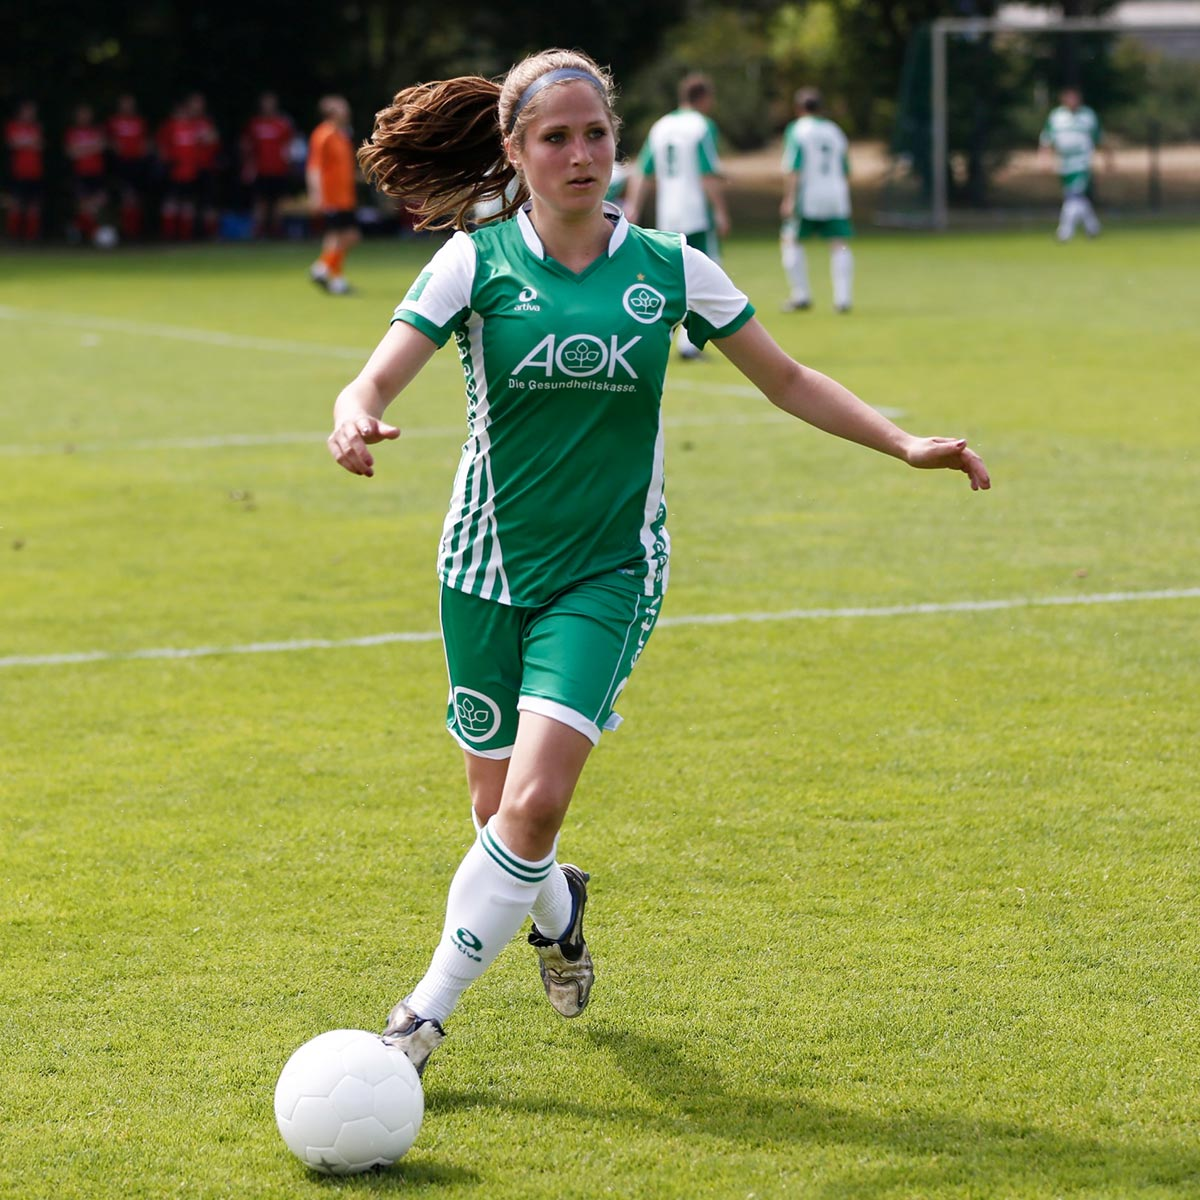 Damen Fußball-Trikot selbst gestalten